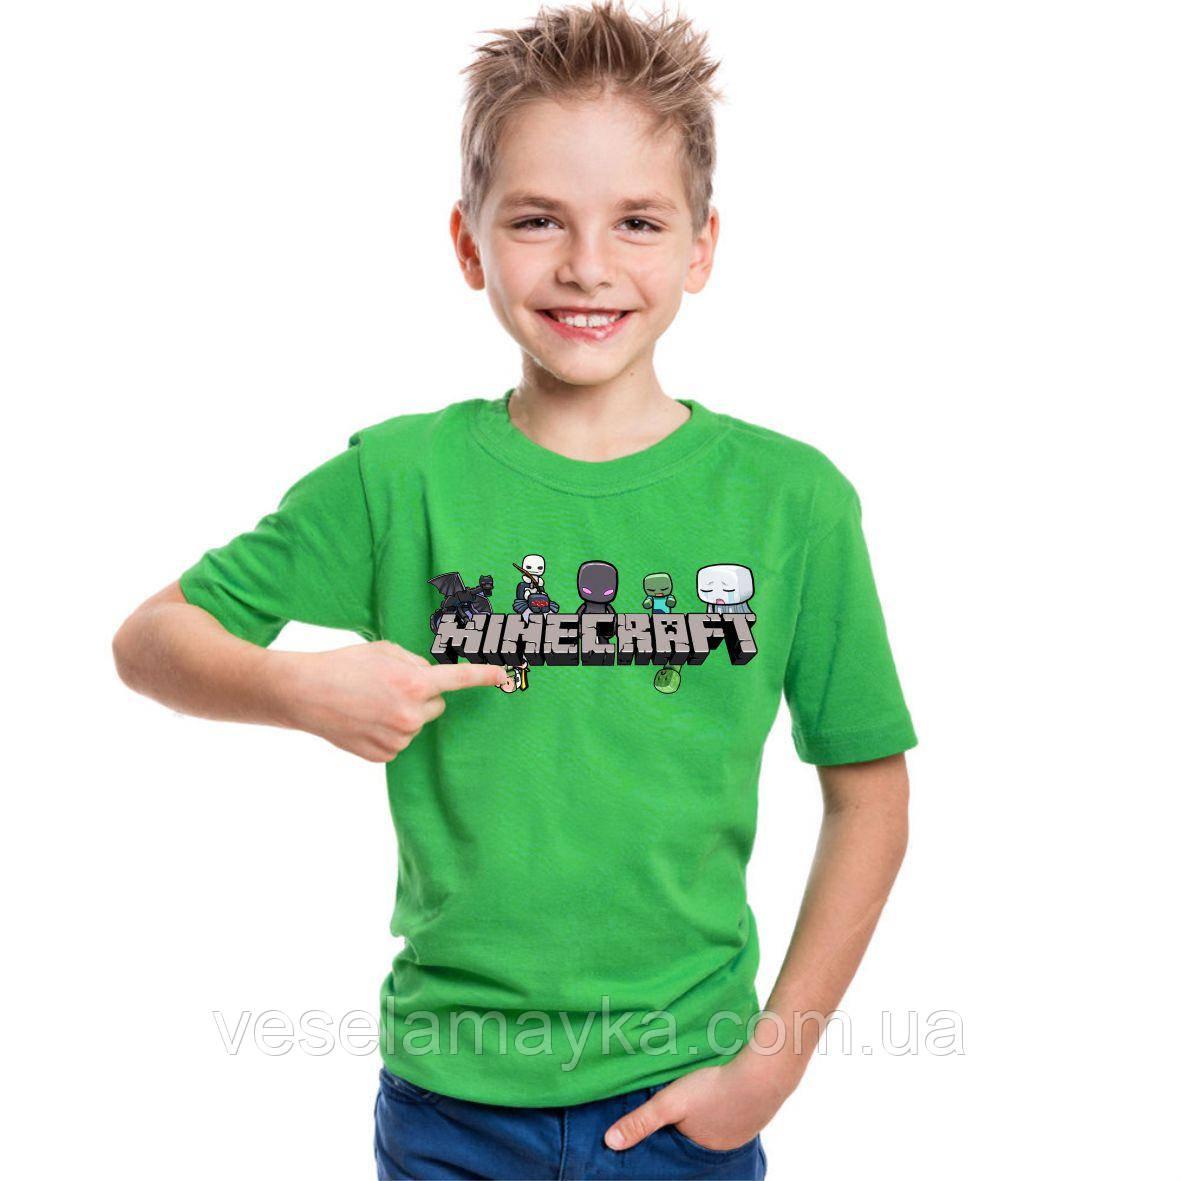 Дитяча футболка Minecraft 6 (Майнкрафт)